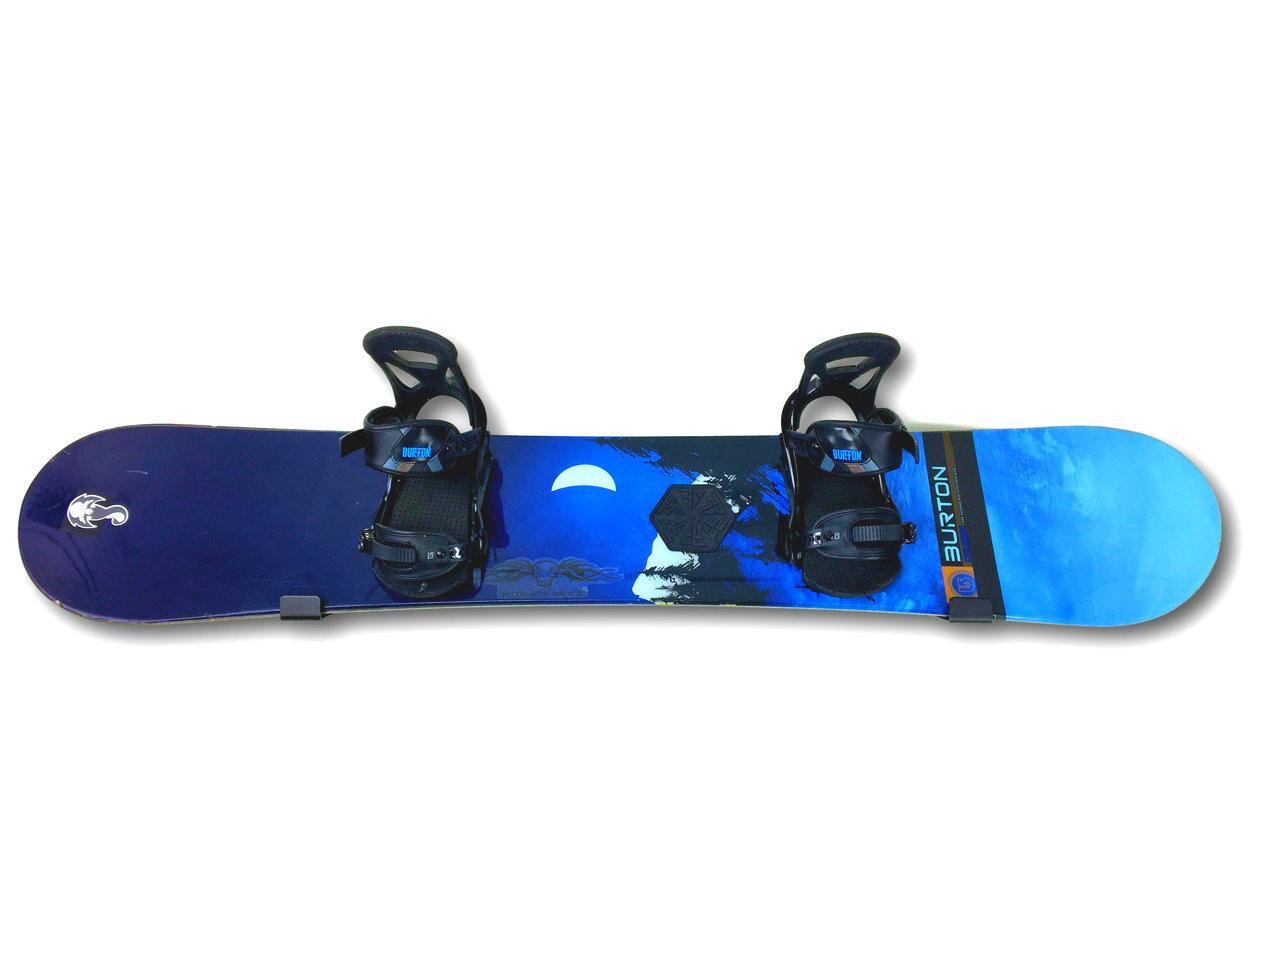 Naked Snow  Minimalist Snowboard Rack - Storeyourboardcom-3849